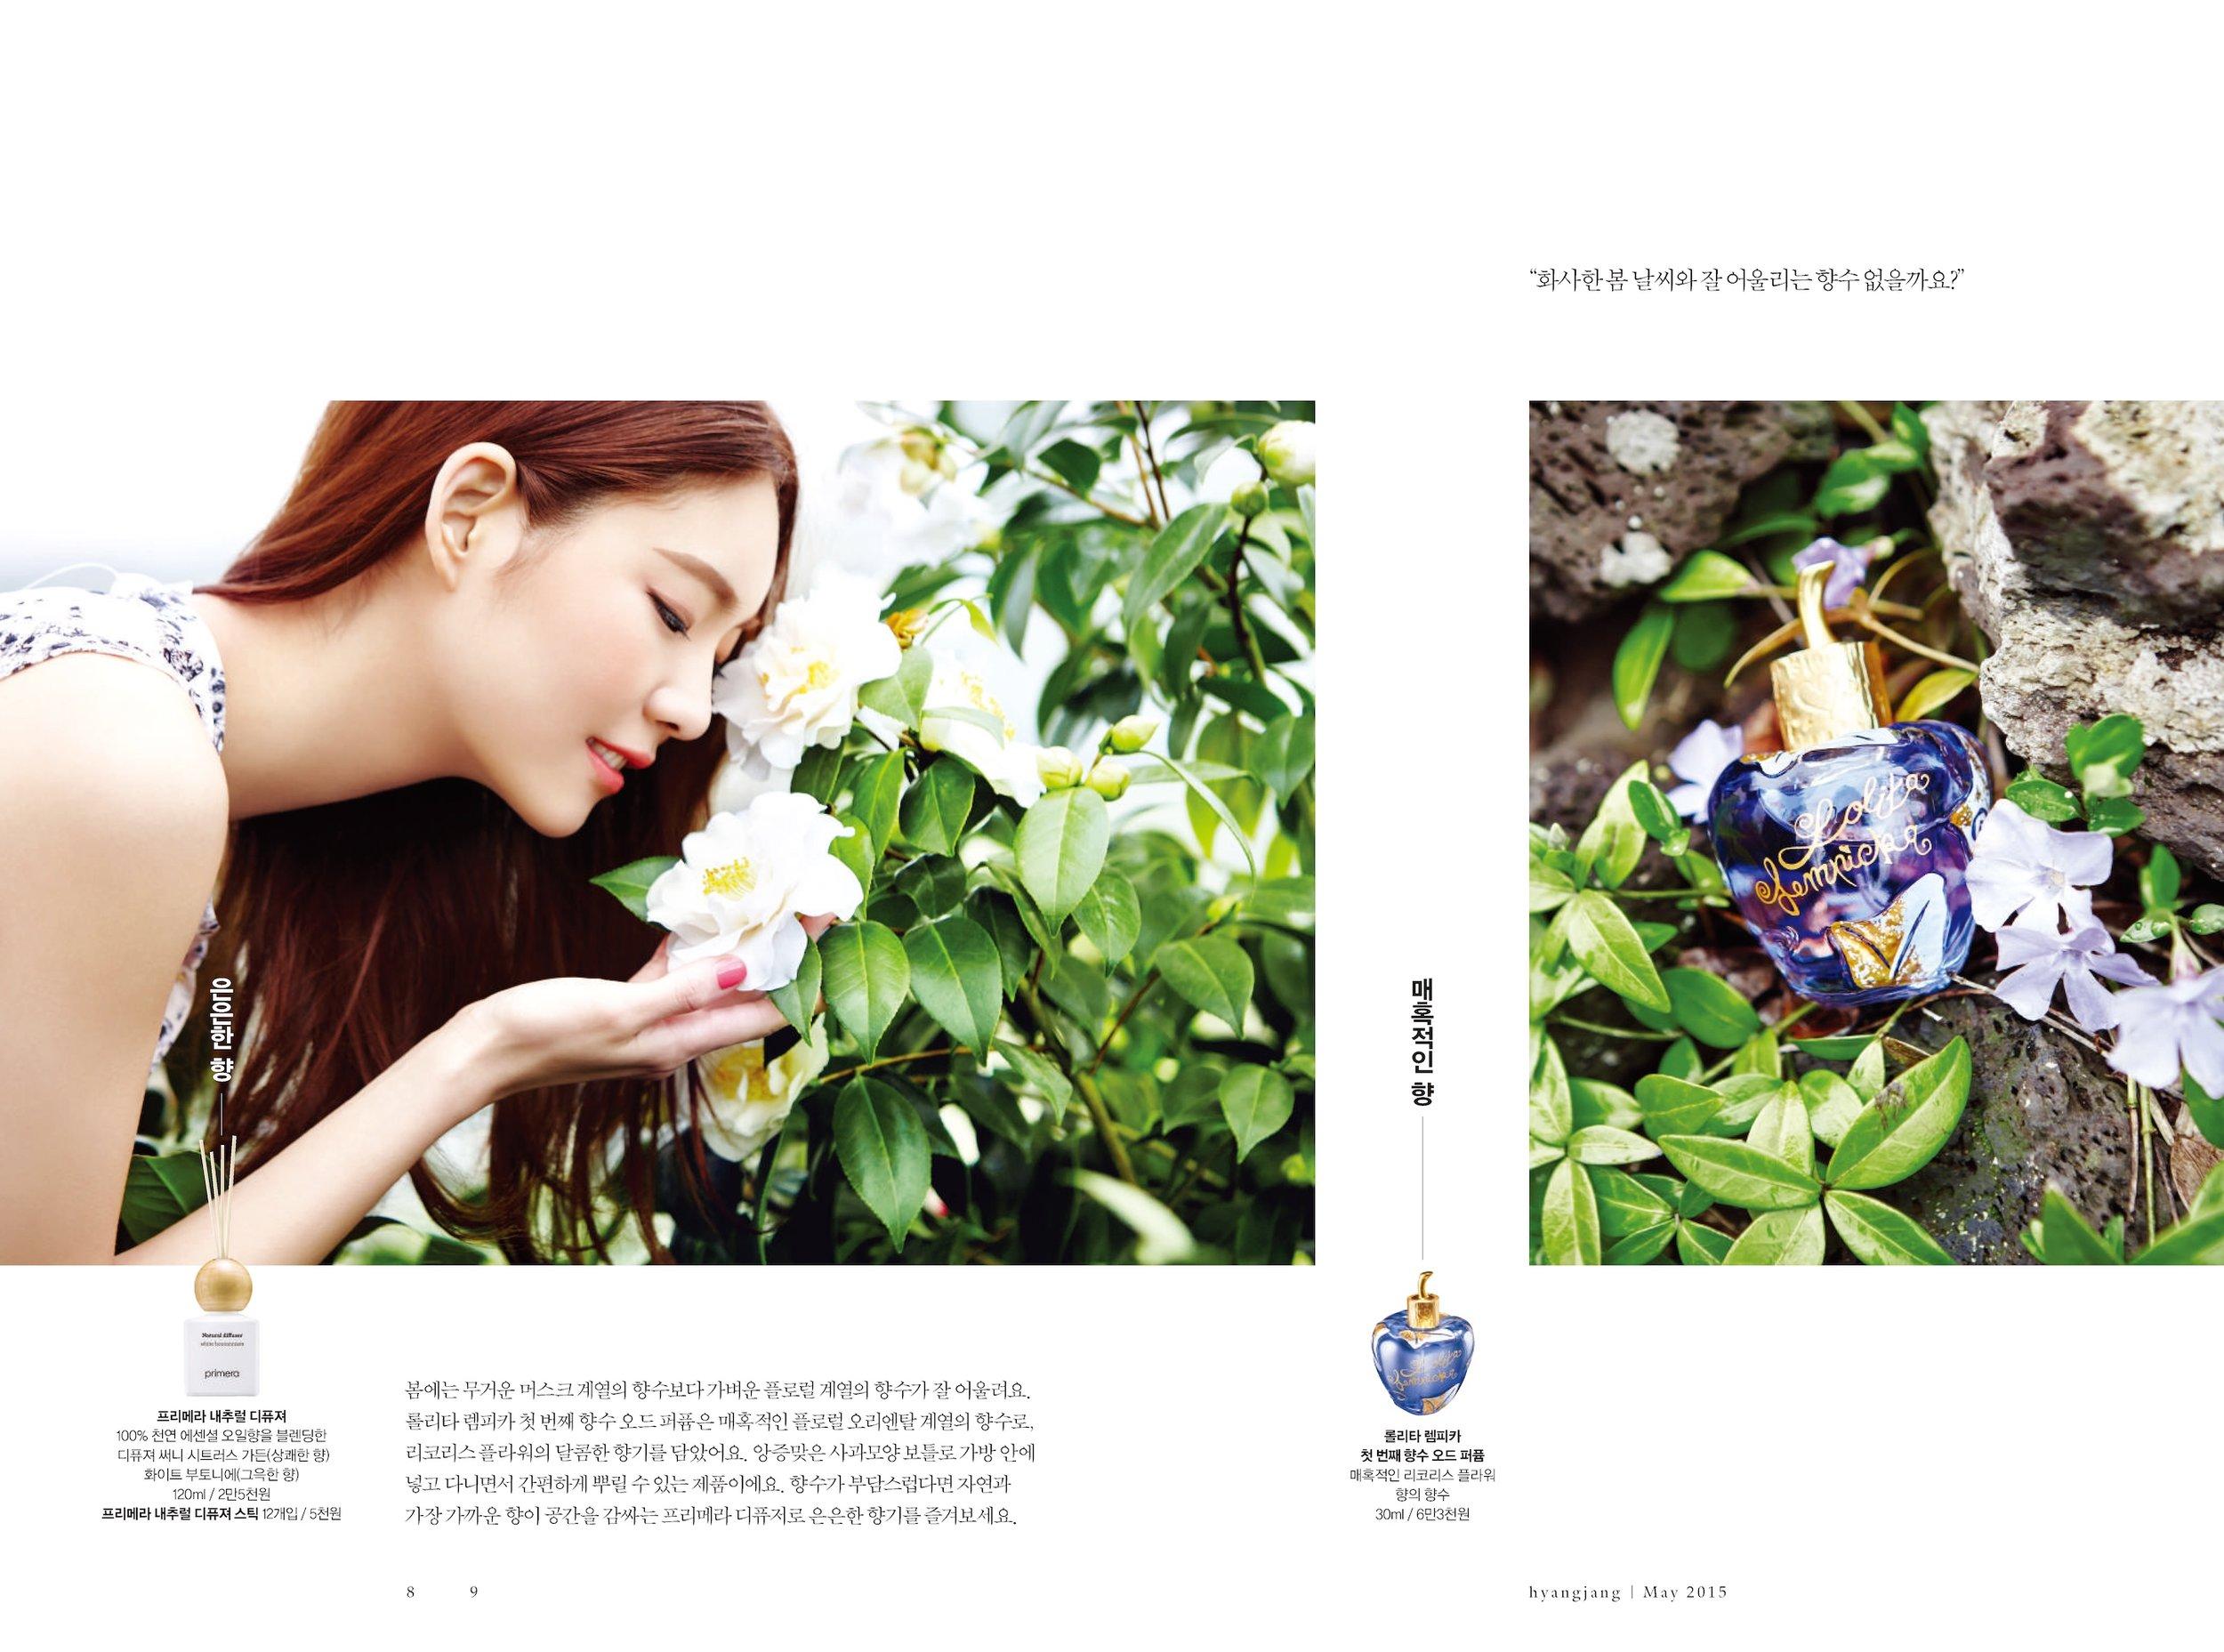 hyangjang-201505_페이지_05.jpeg